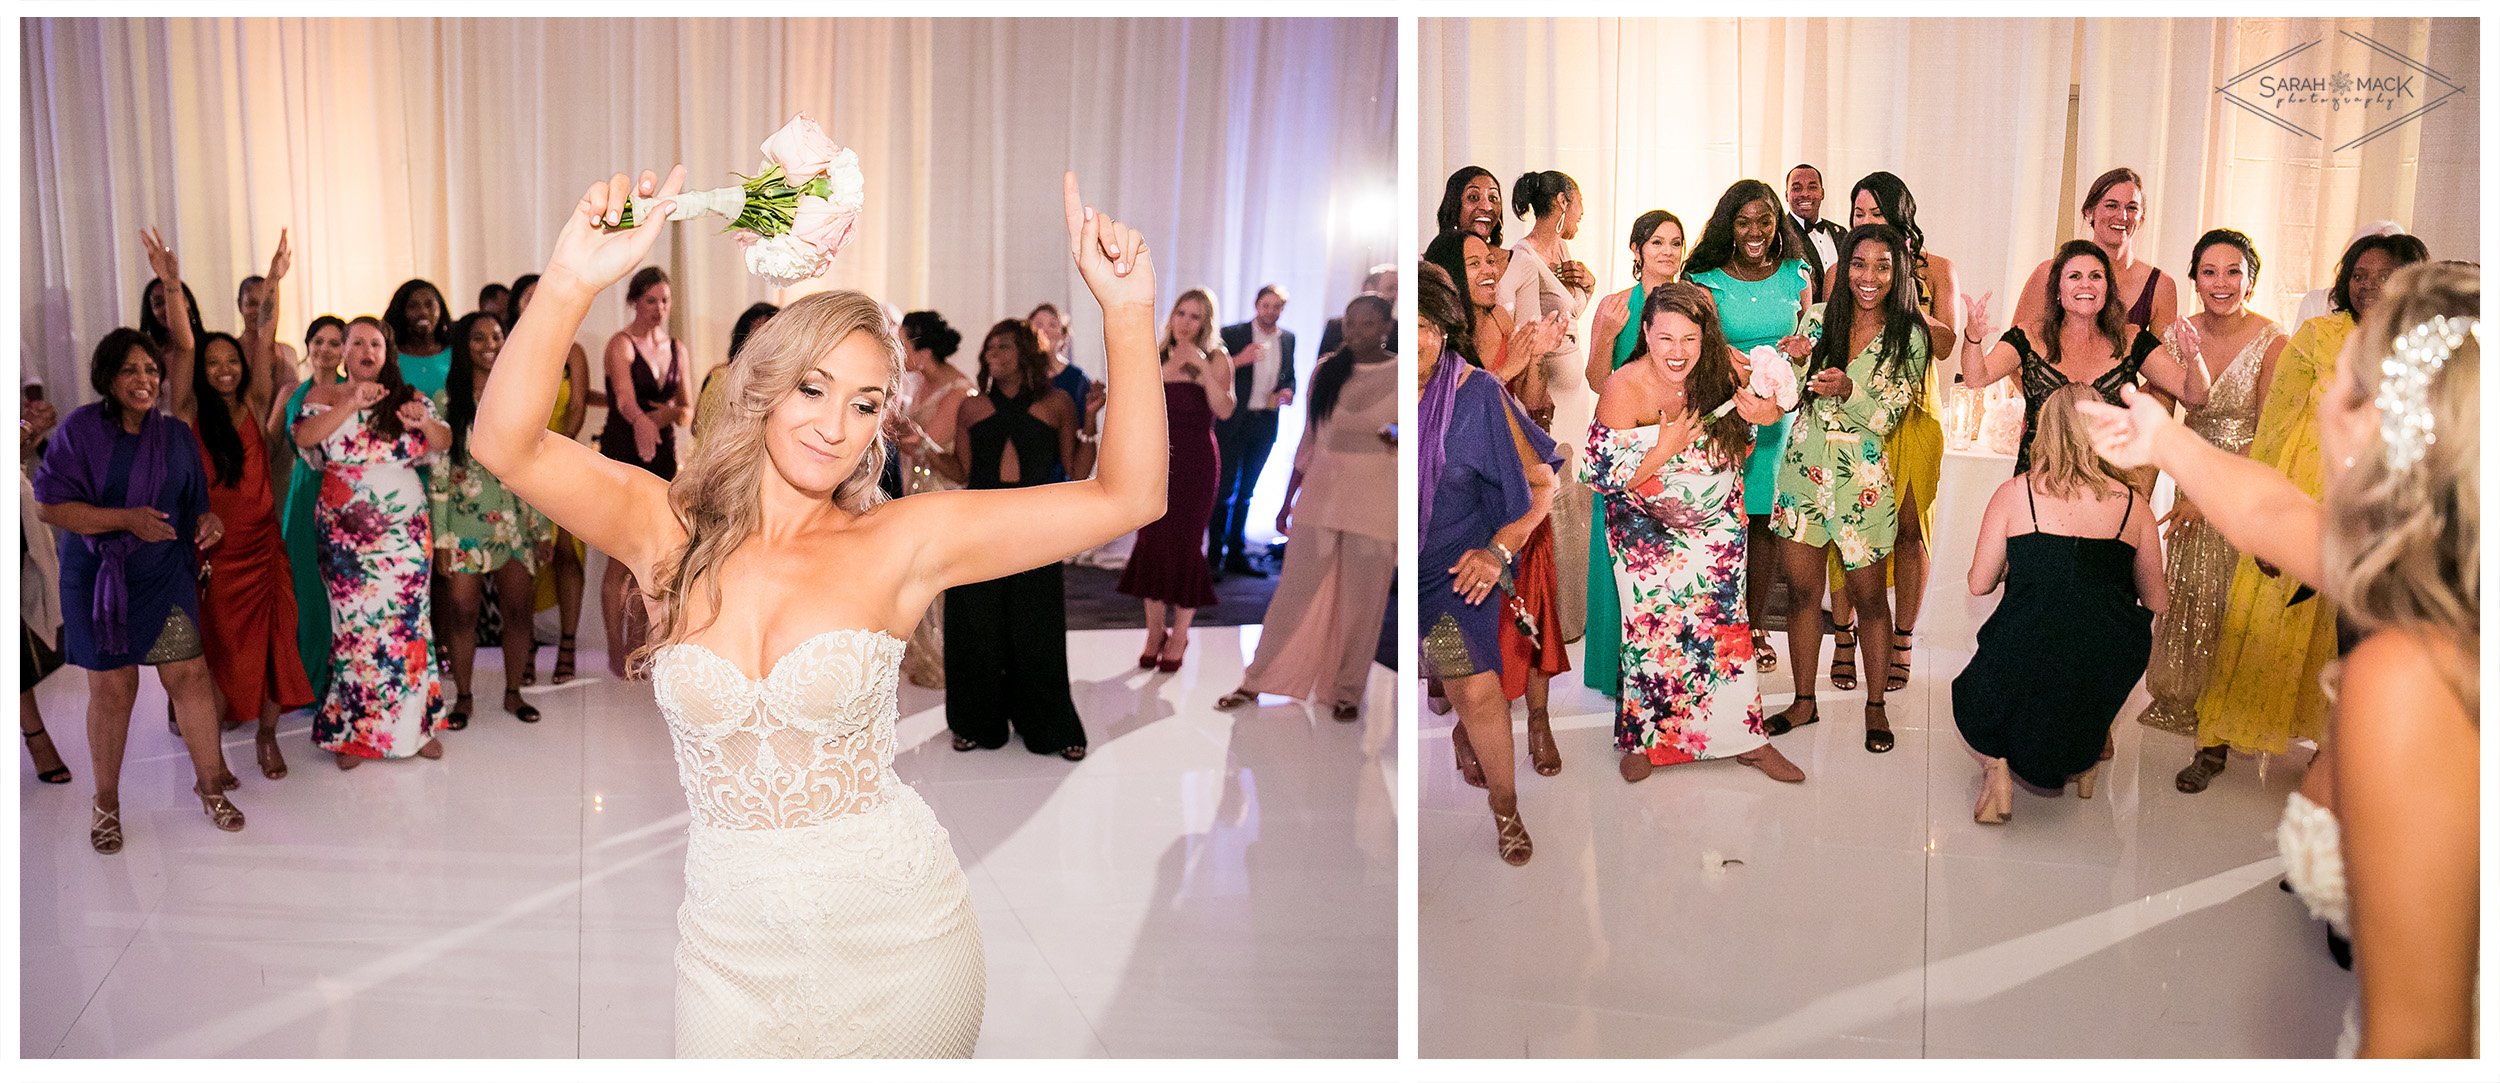 MK-Santa-Monica-Catholic-Church-Wedding-Photography-58.jpg